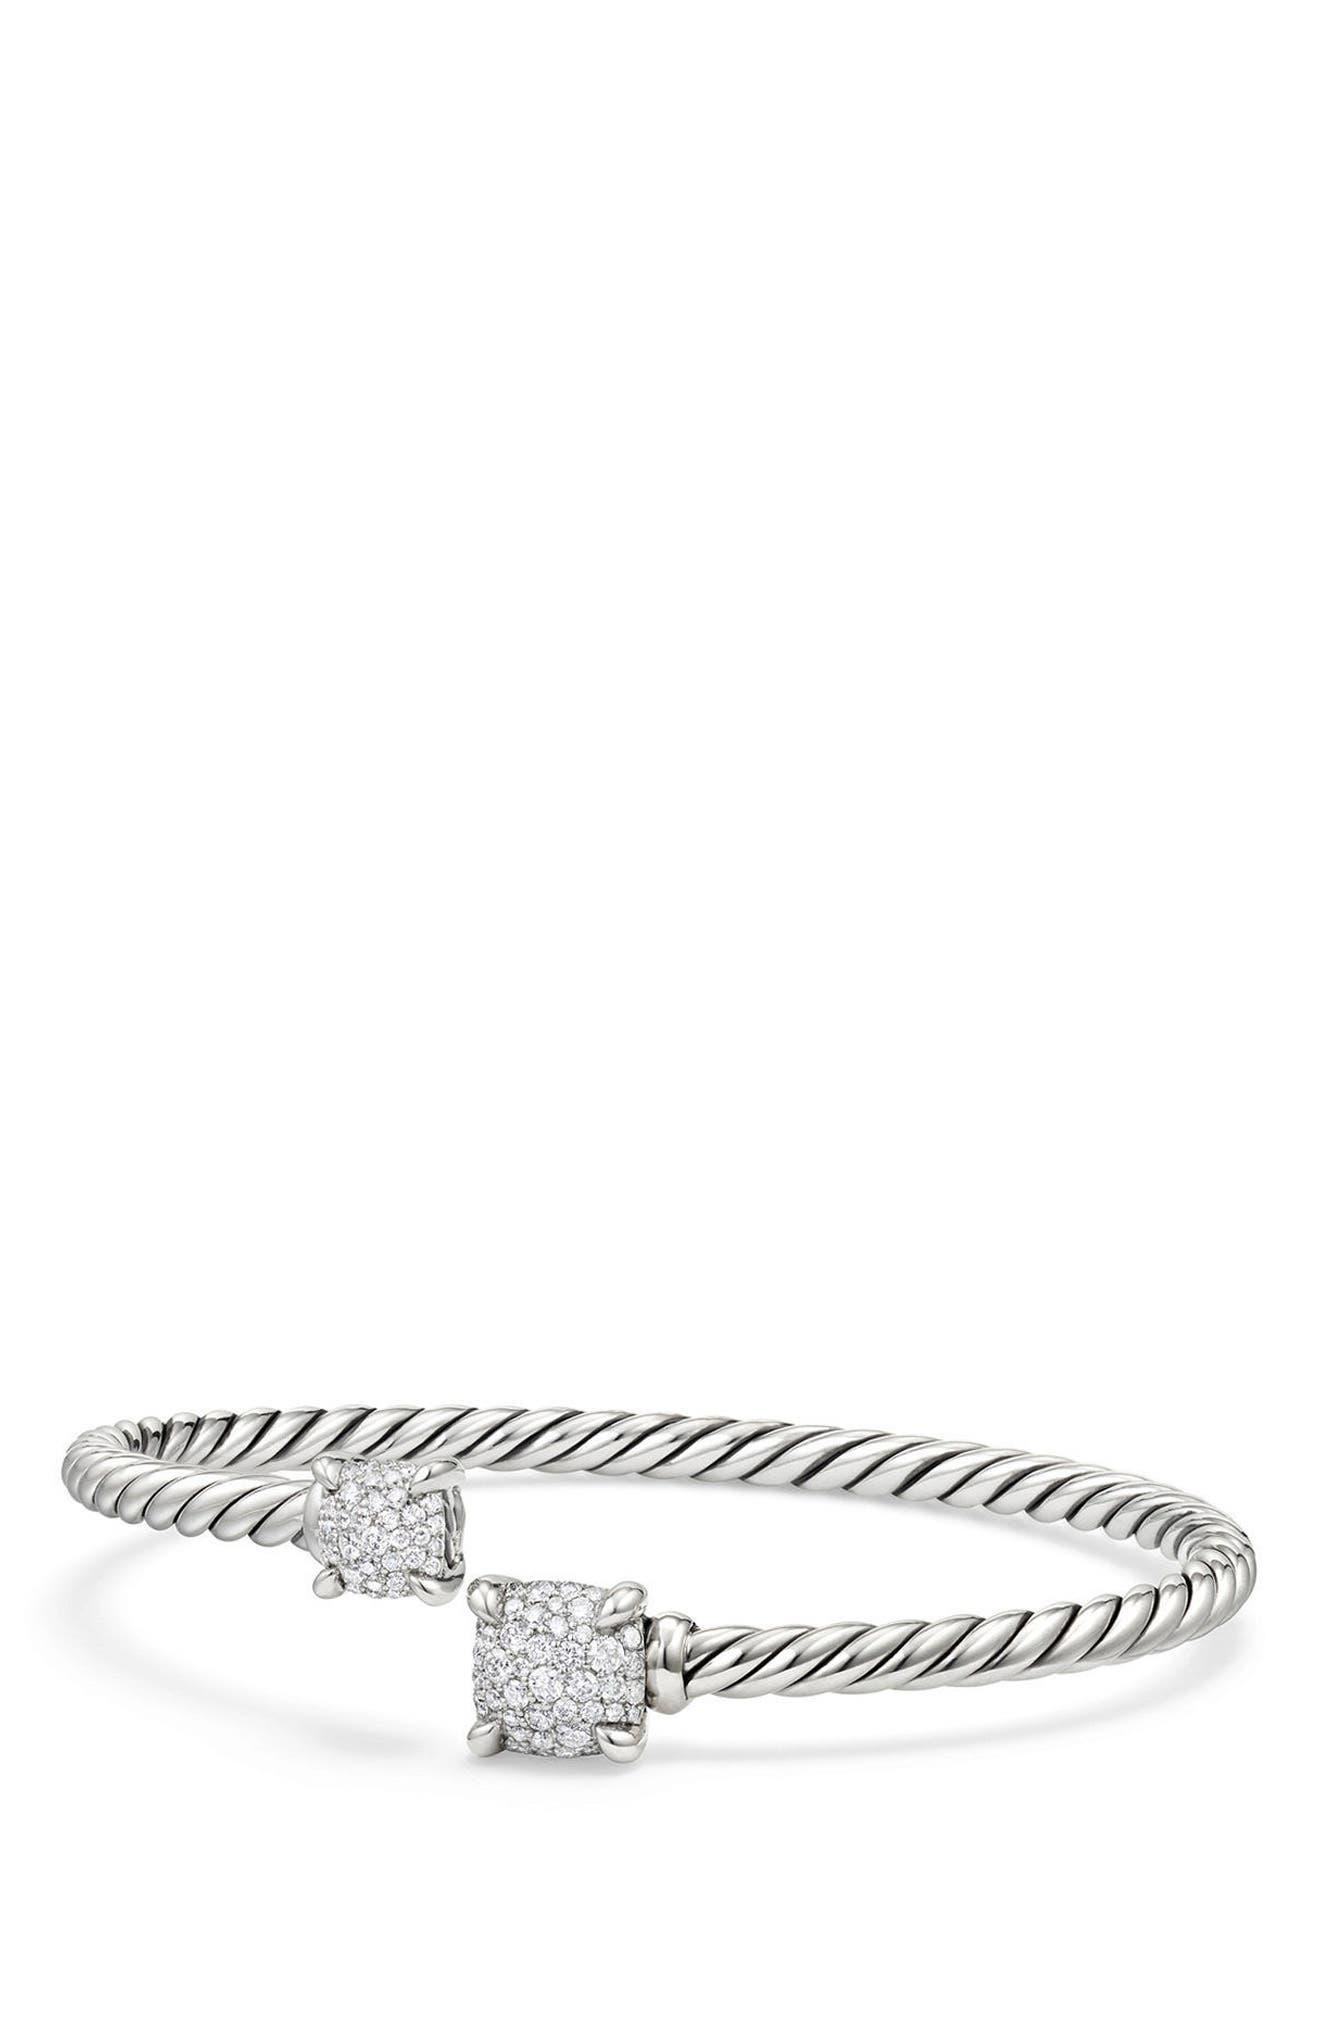 Main Image - David Yurman Châtelaine Bypass Bracelet with Diamonds